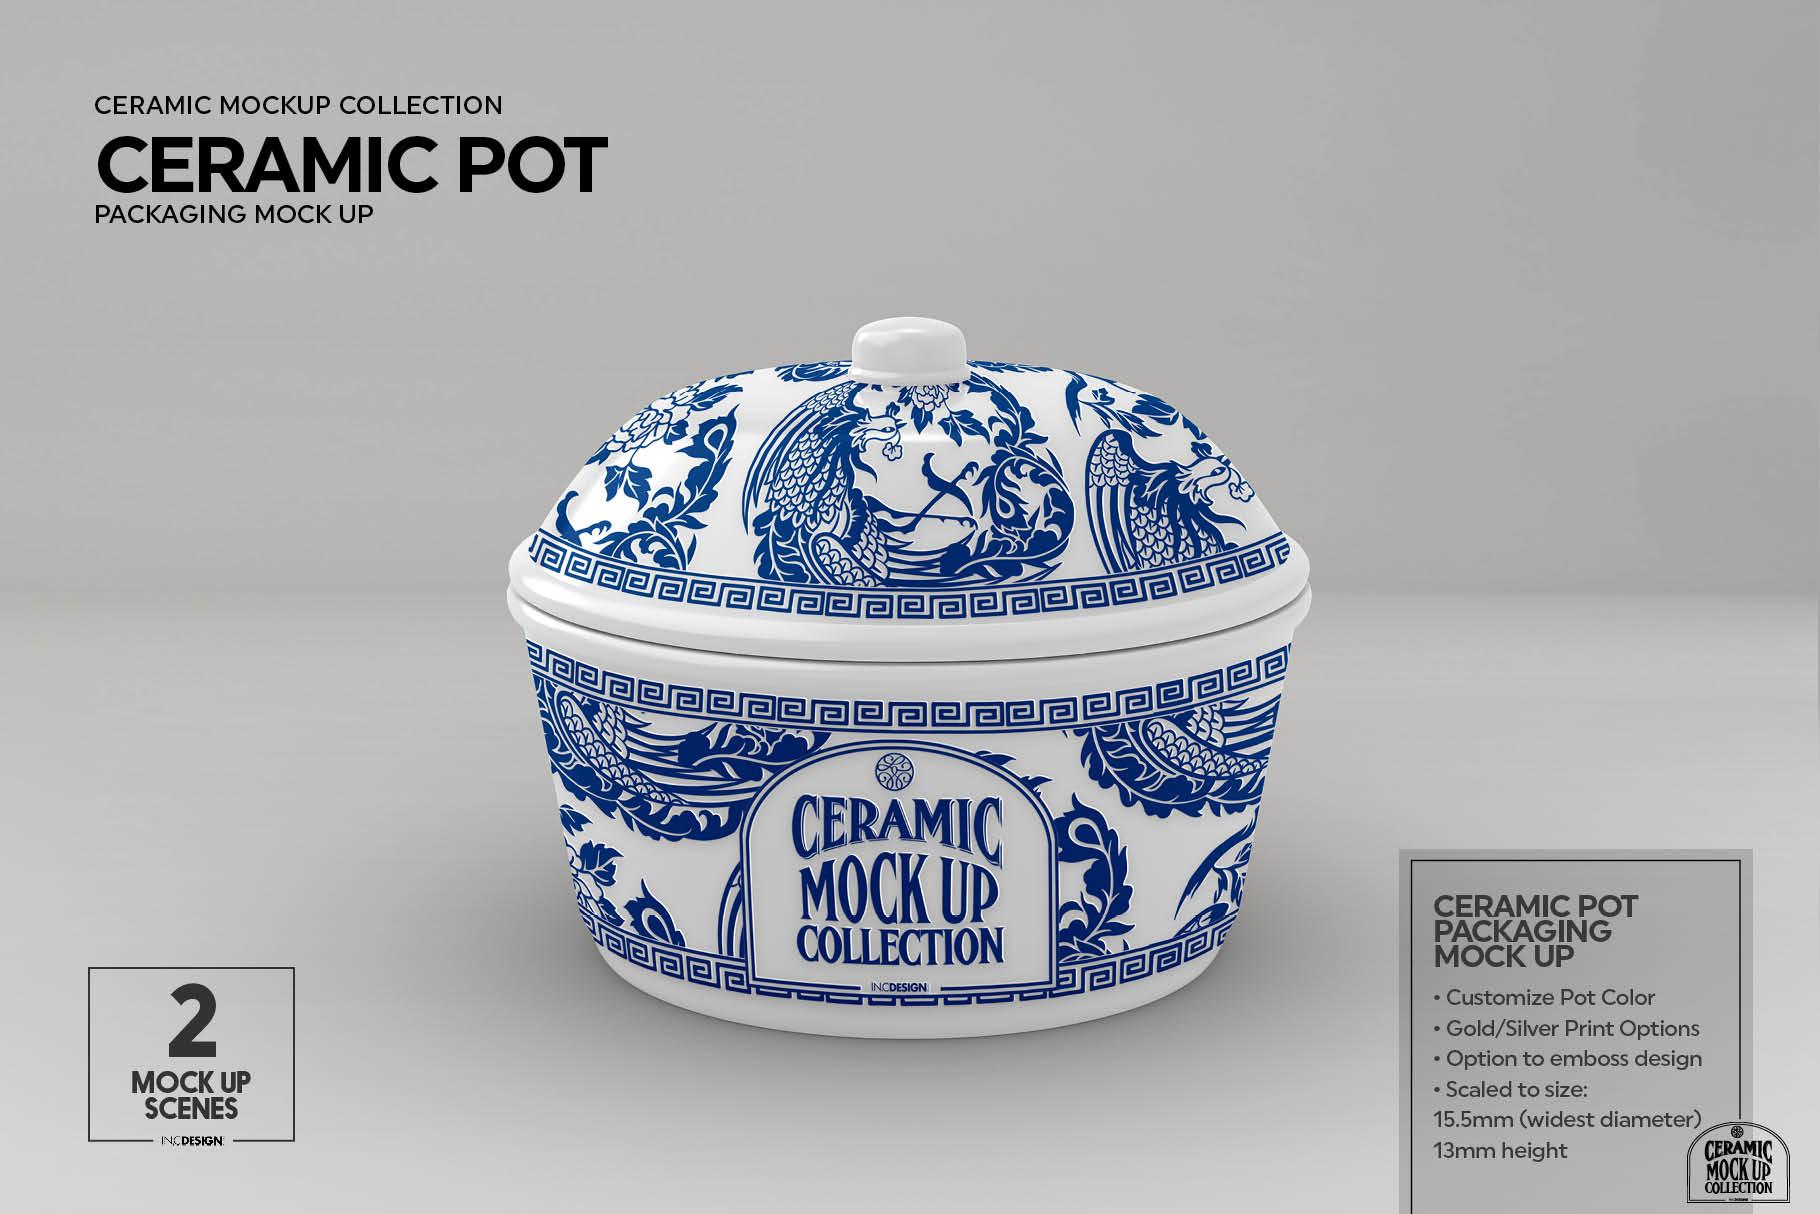 Ceramic Pot Packaging Mock Up example image 2